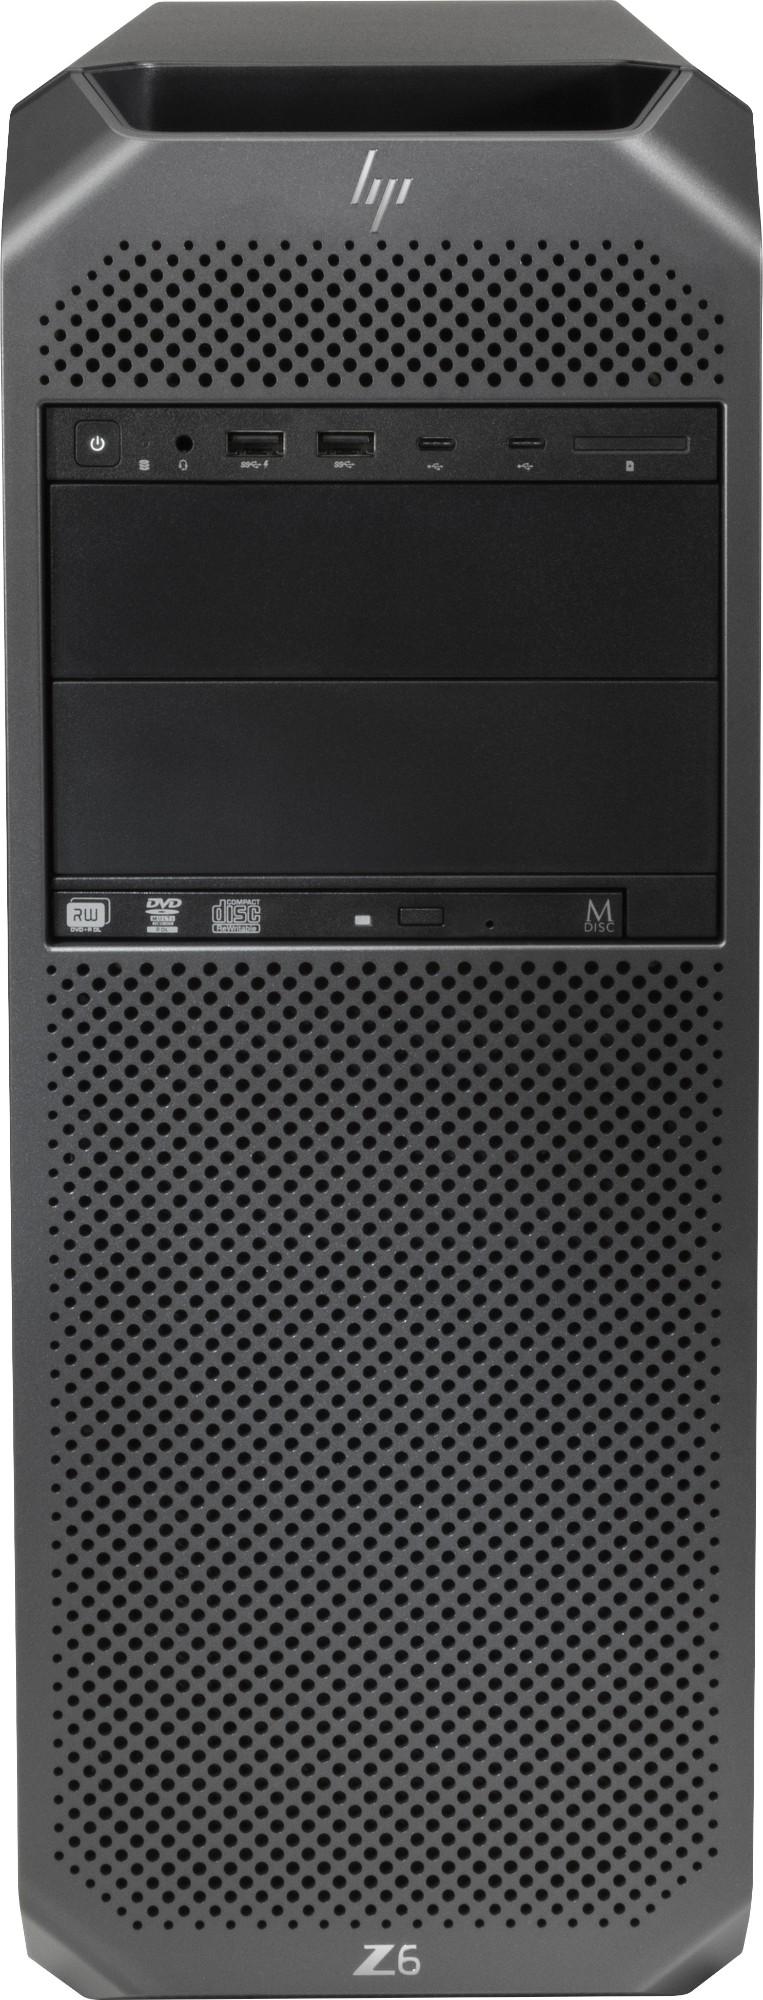 Workstation Z6 - 4108 - 32GB RAM - 1TB HDD - Win10 Pro